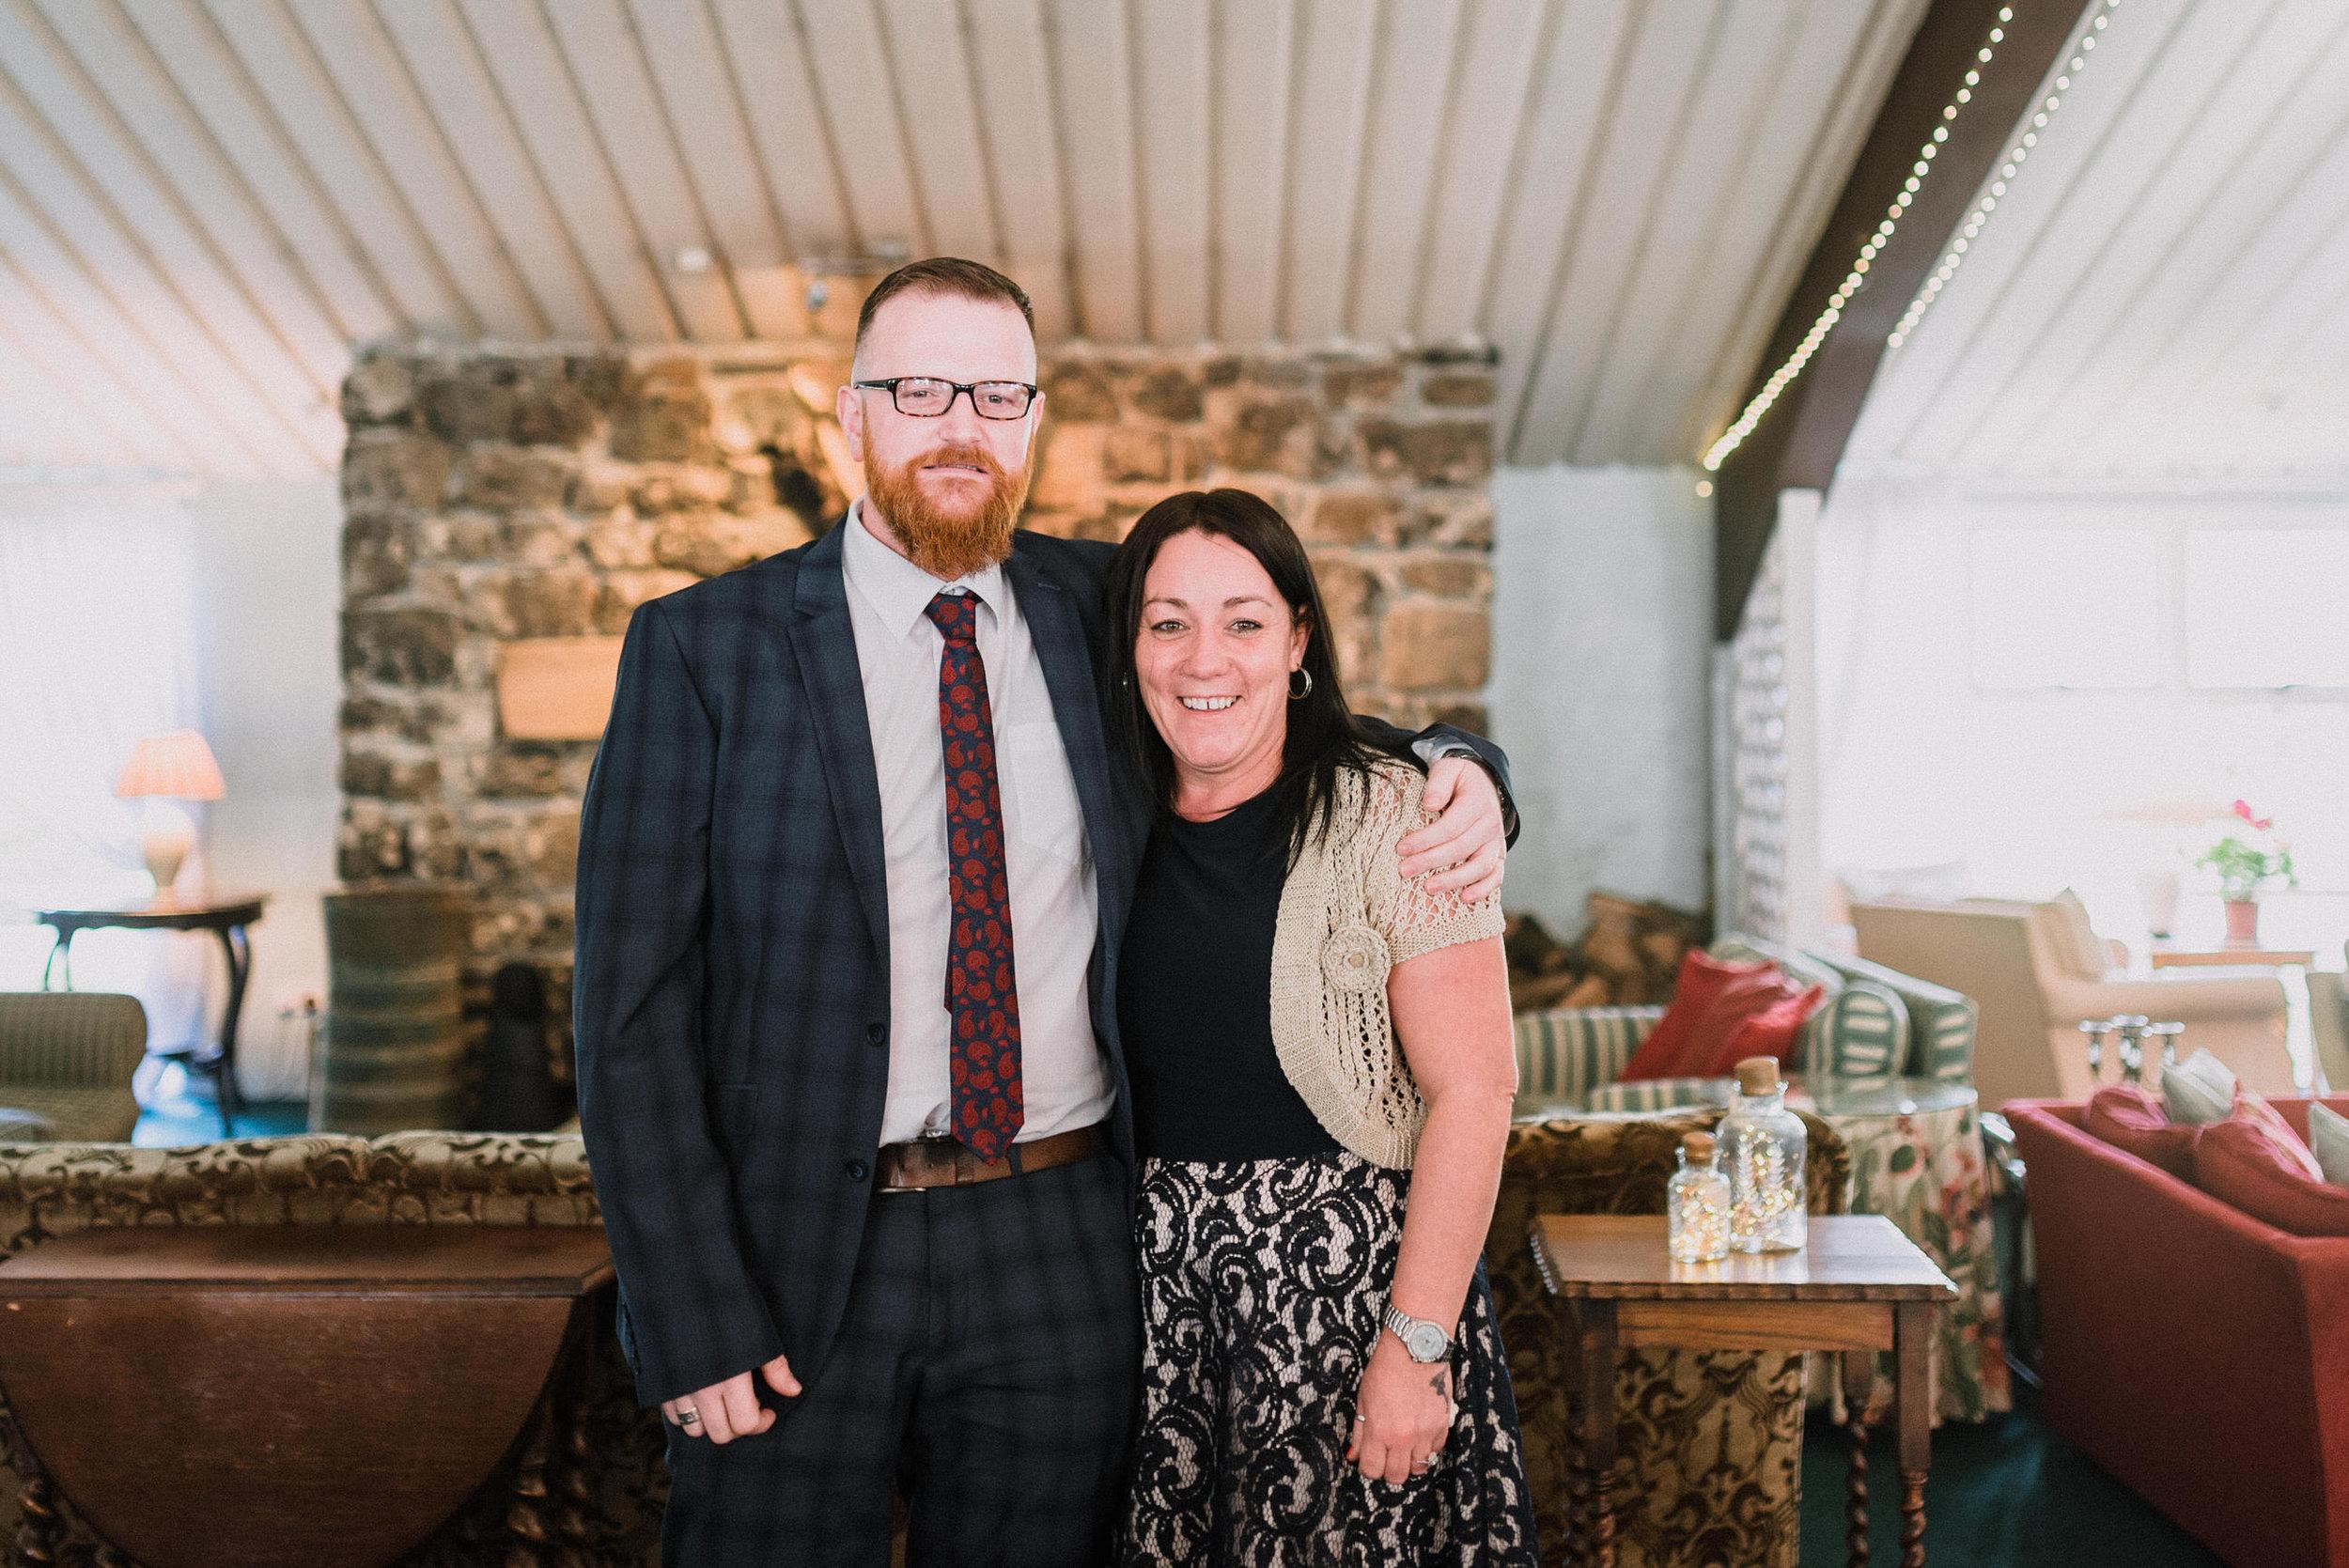 lissanoure castle wedding, northern ireland wedding photographer, romantic northern irish wedding venue, castle wedding ireland, natural wedding photography ni (104).jpg